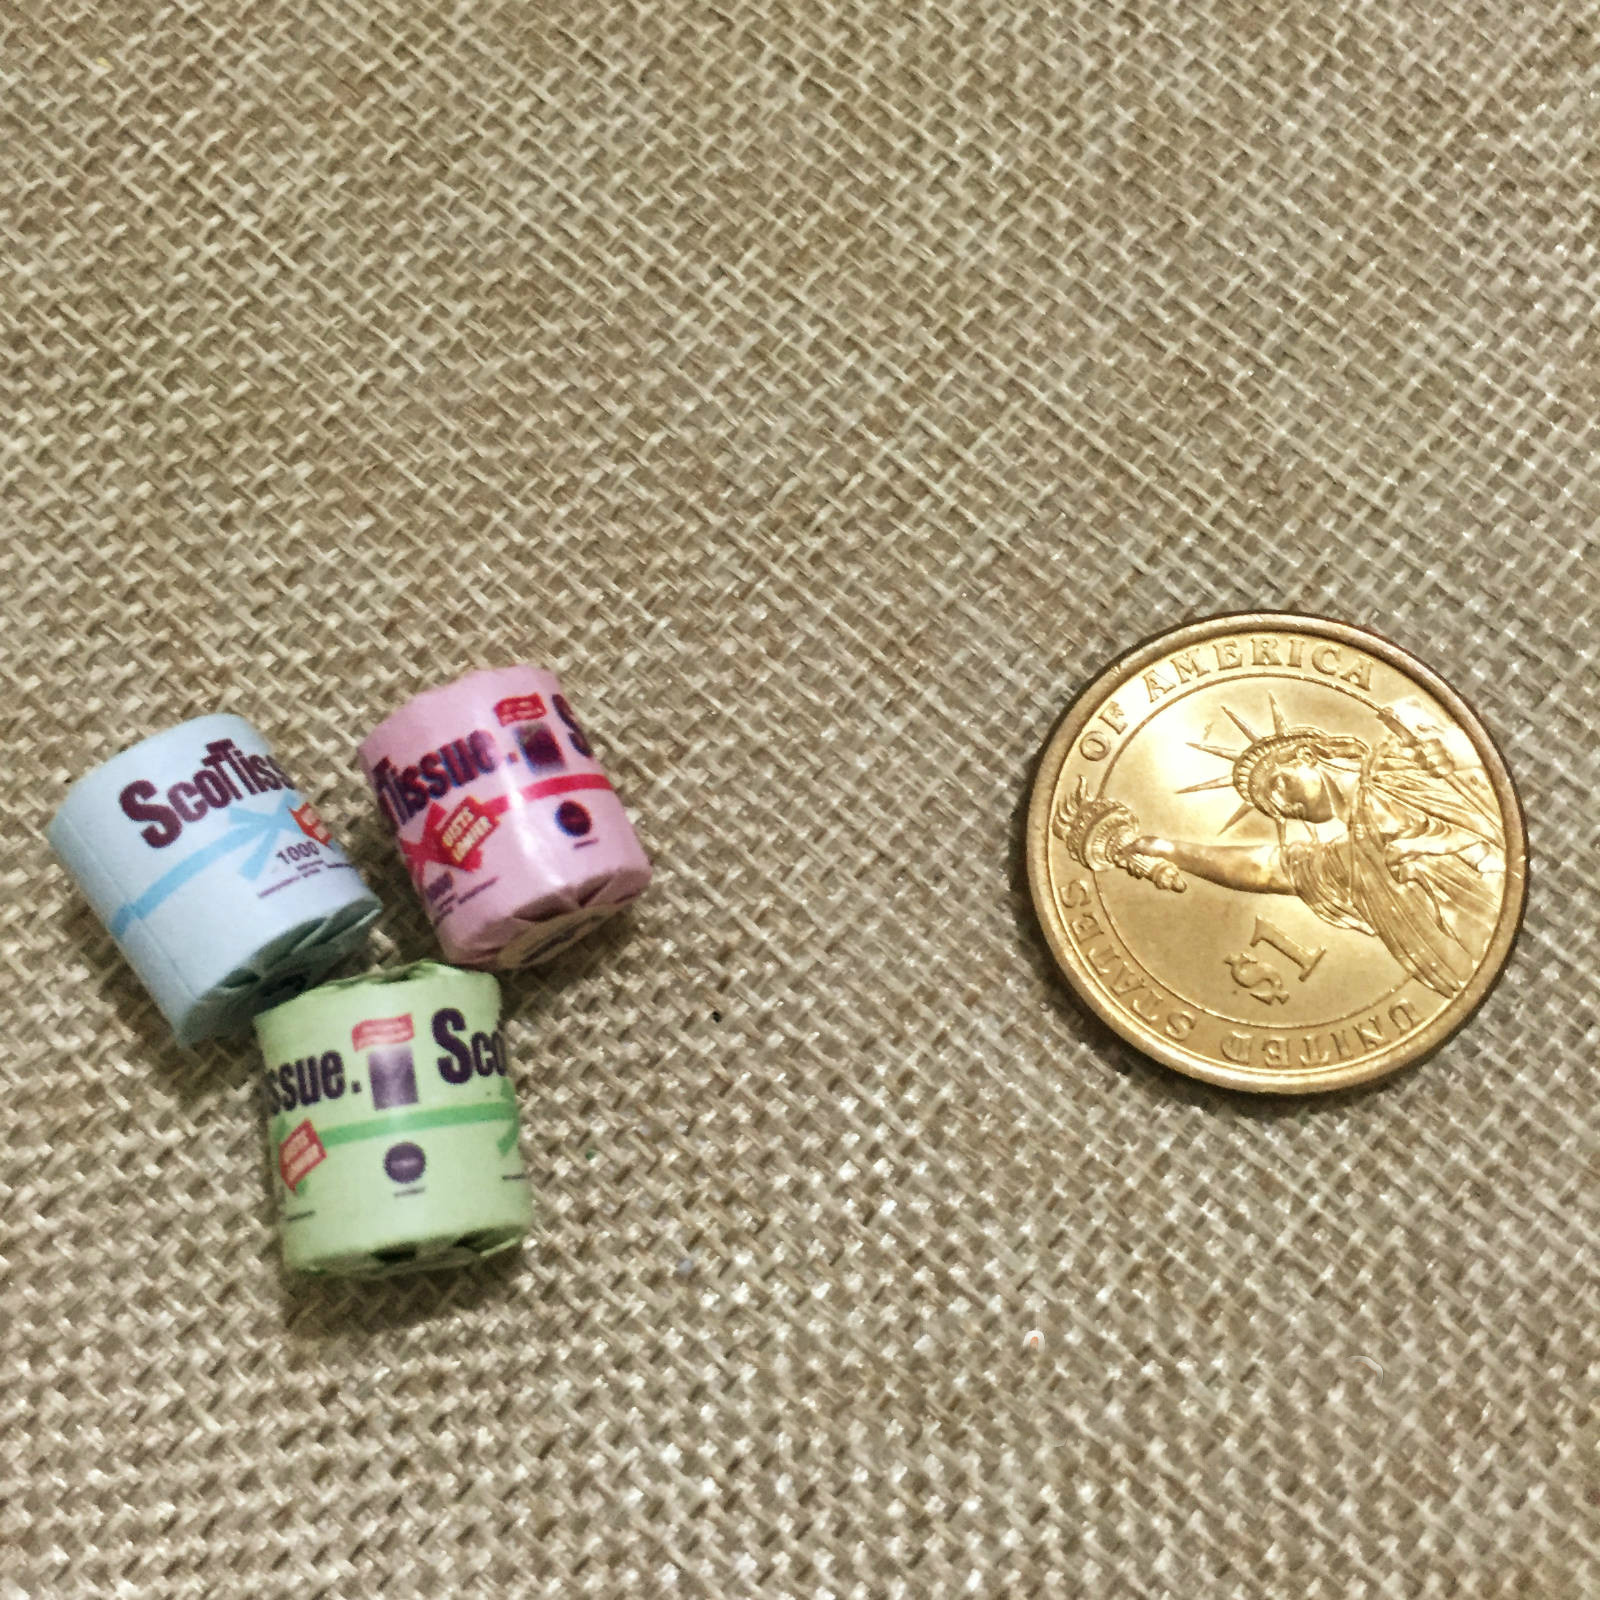 3Pcs Roll of bathroom tissue toilet paper 1:12 dollhouse miniature toy VVUS